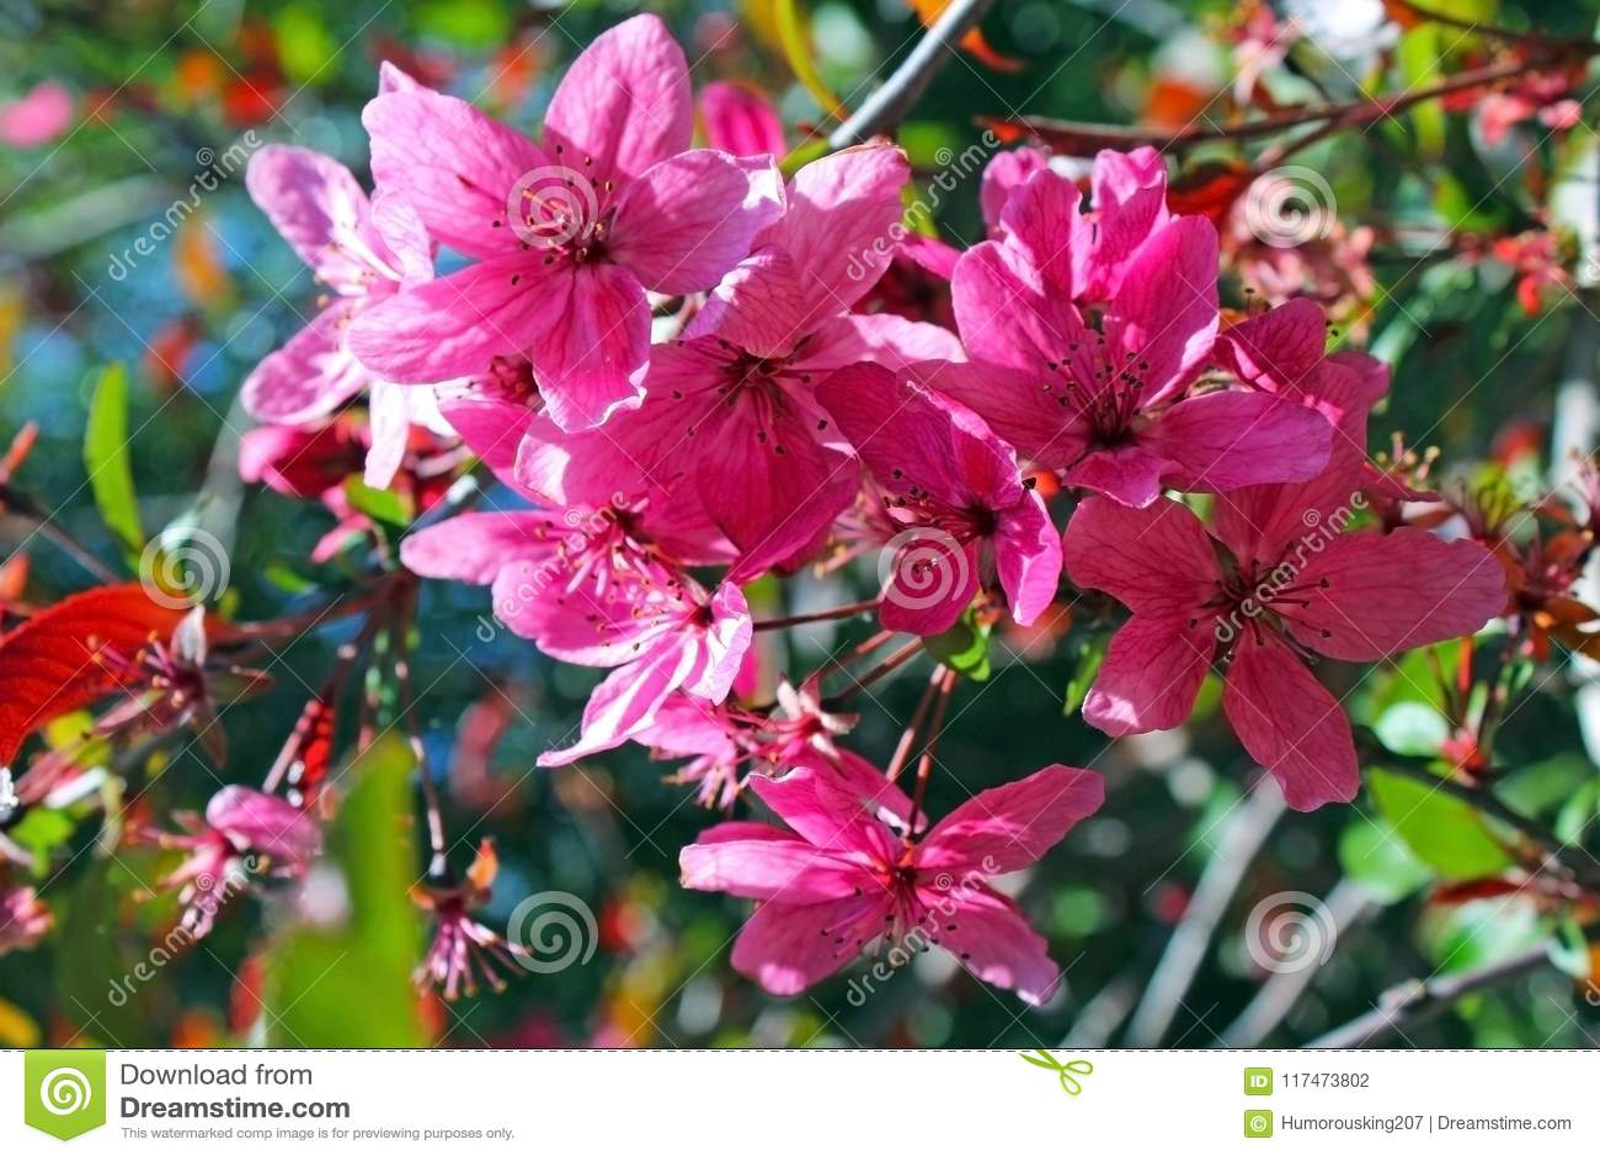 Pink Azalea Flowers In Bloom Stock Photo Image Of Springtime Leaf